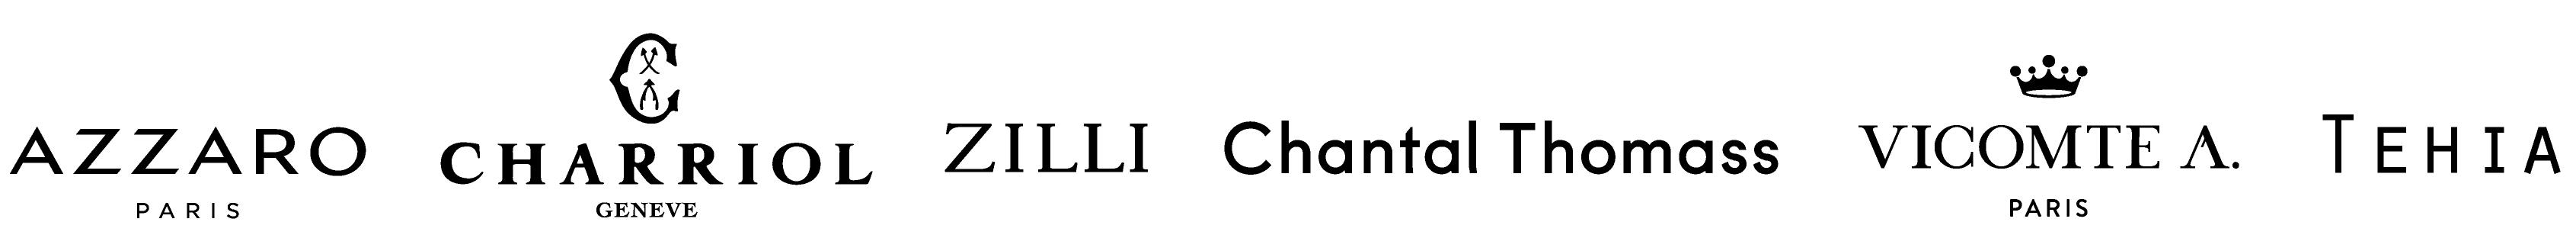 Logos-noir-fond-blanc